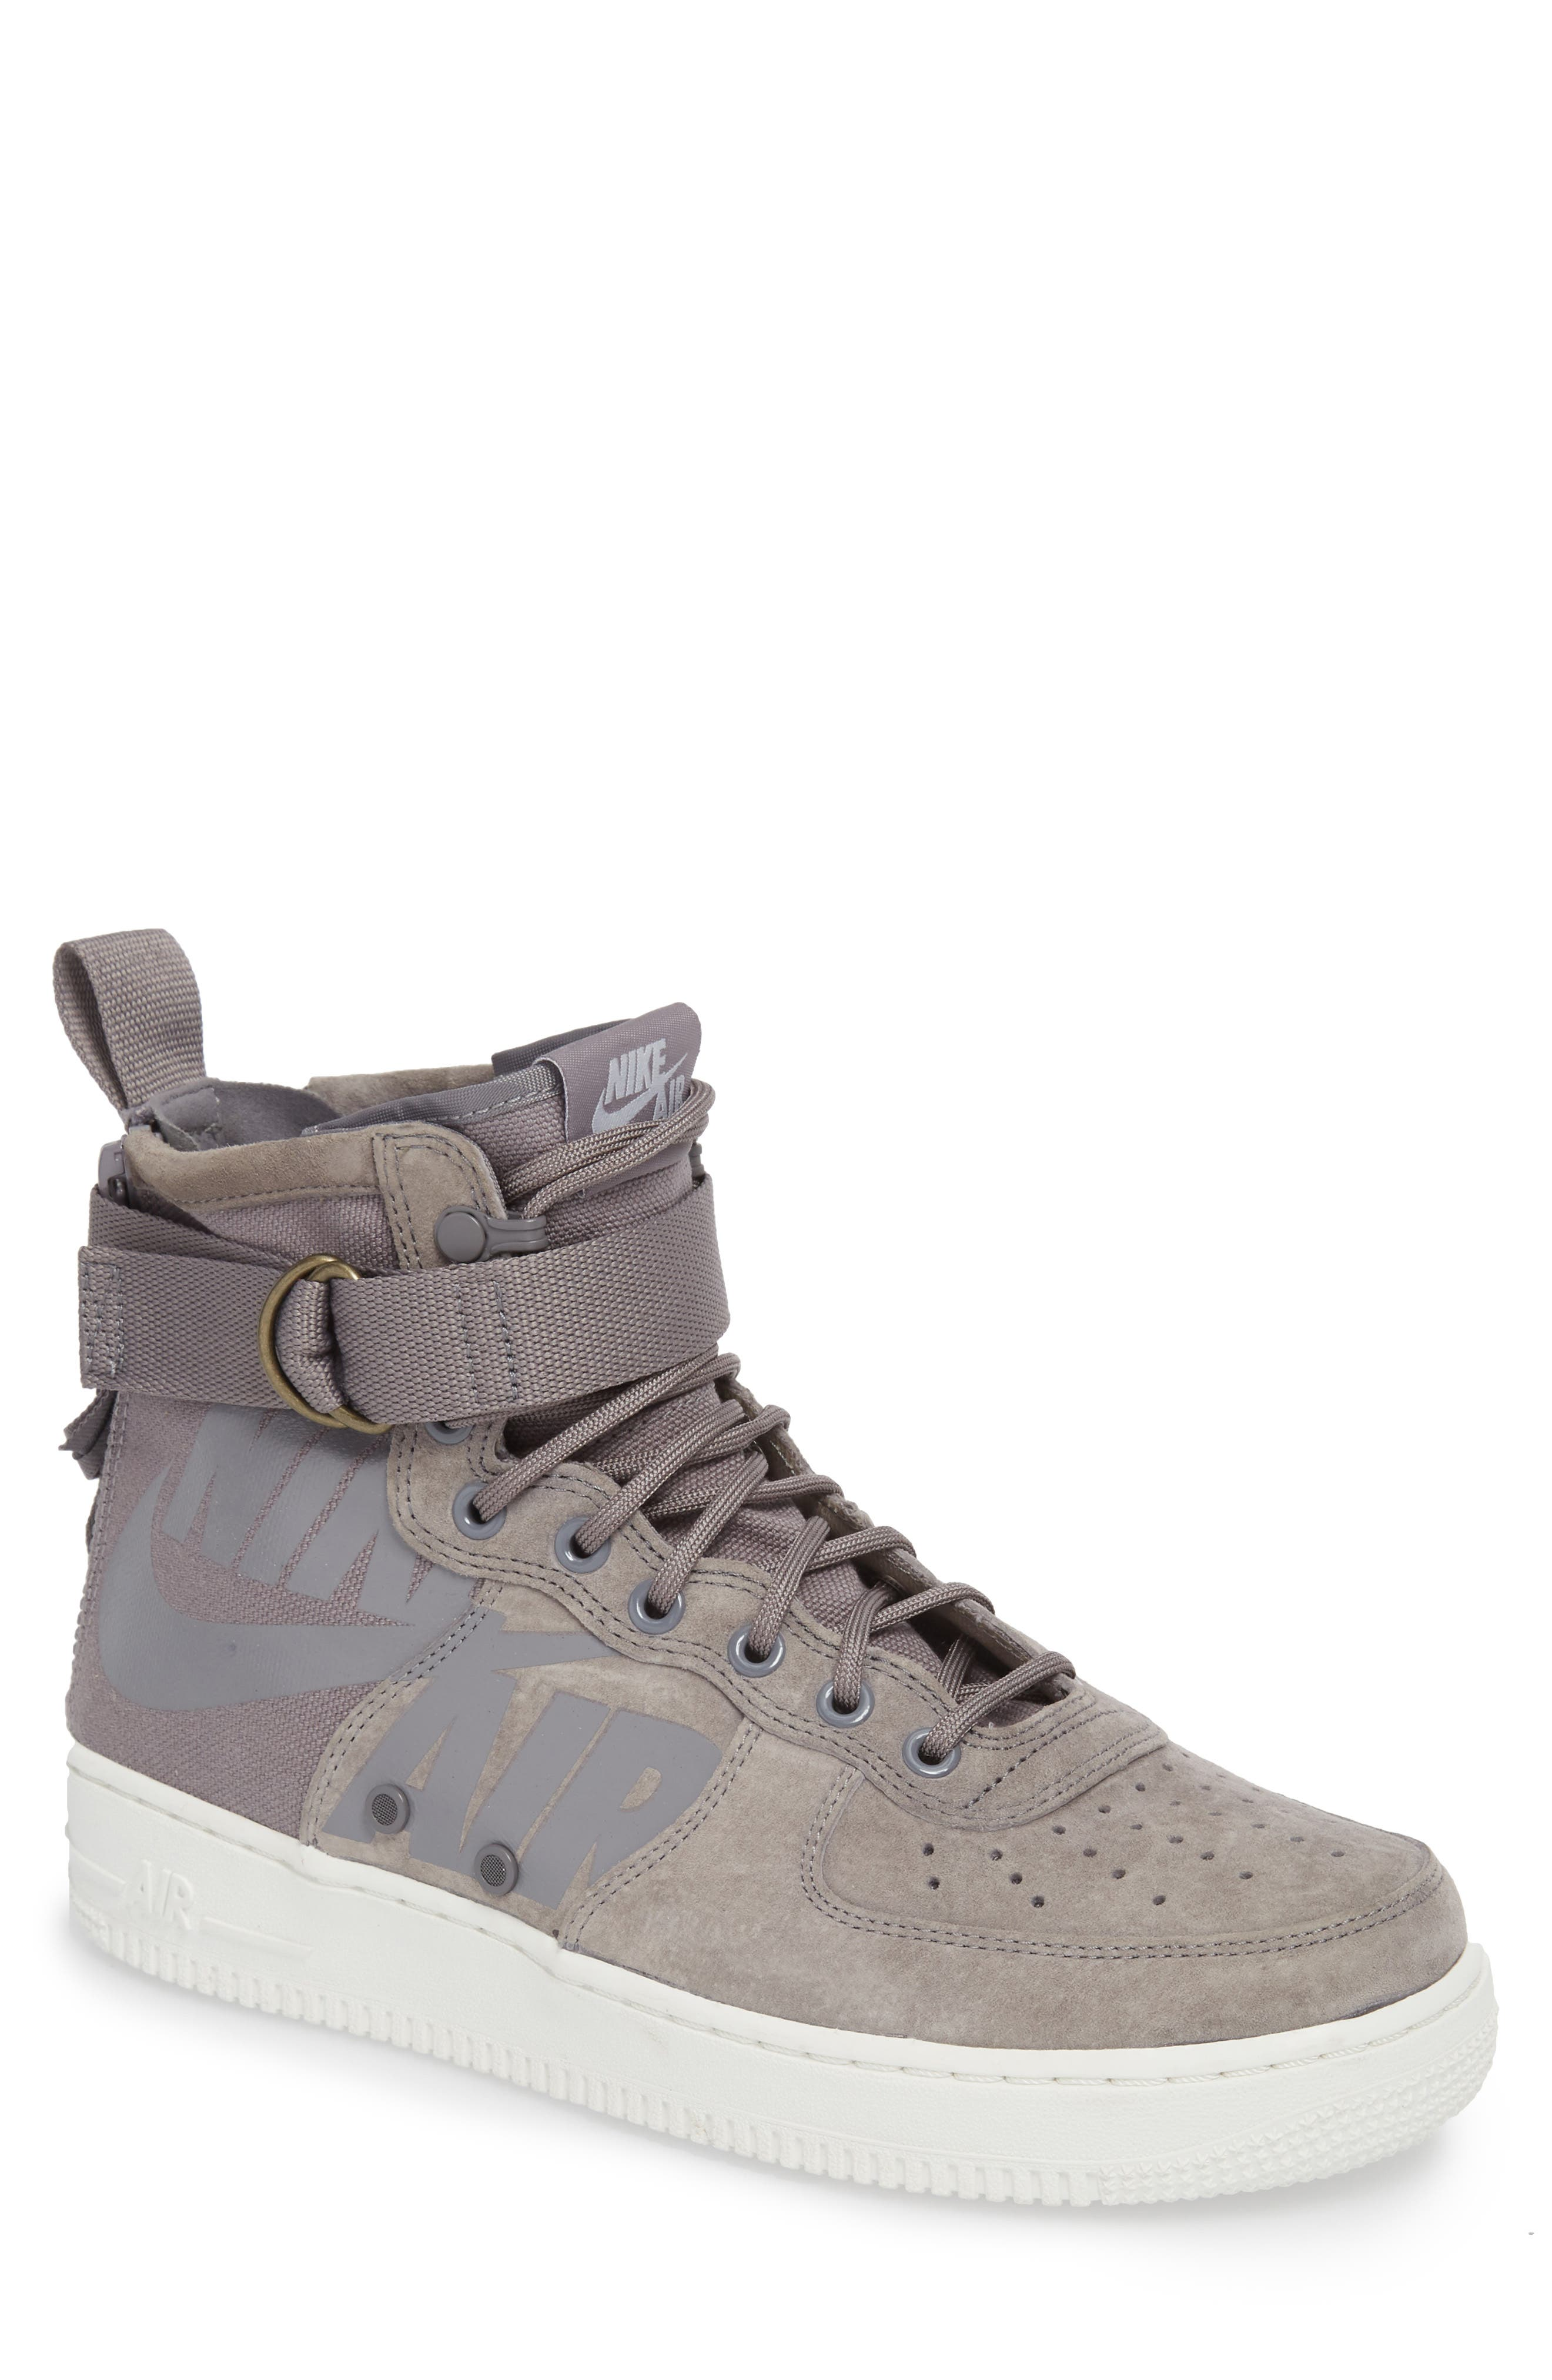 SF Air Force 1 Mid Sneaker,                             Main thumbnail 1, color,                             Gunsmoke/ Wolf Grey/ White